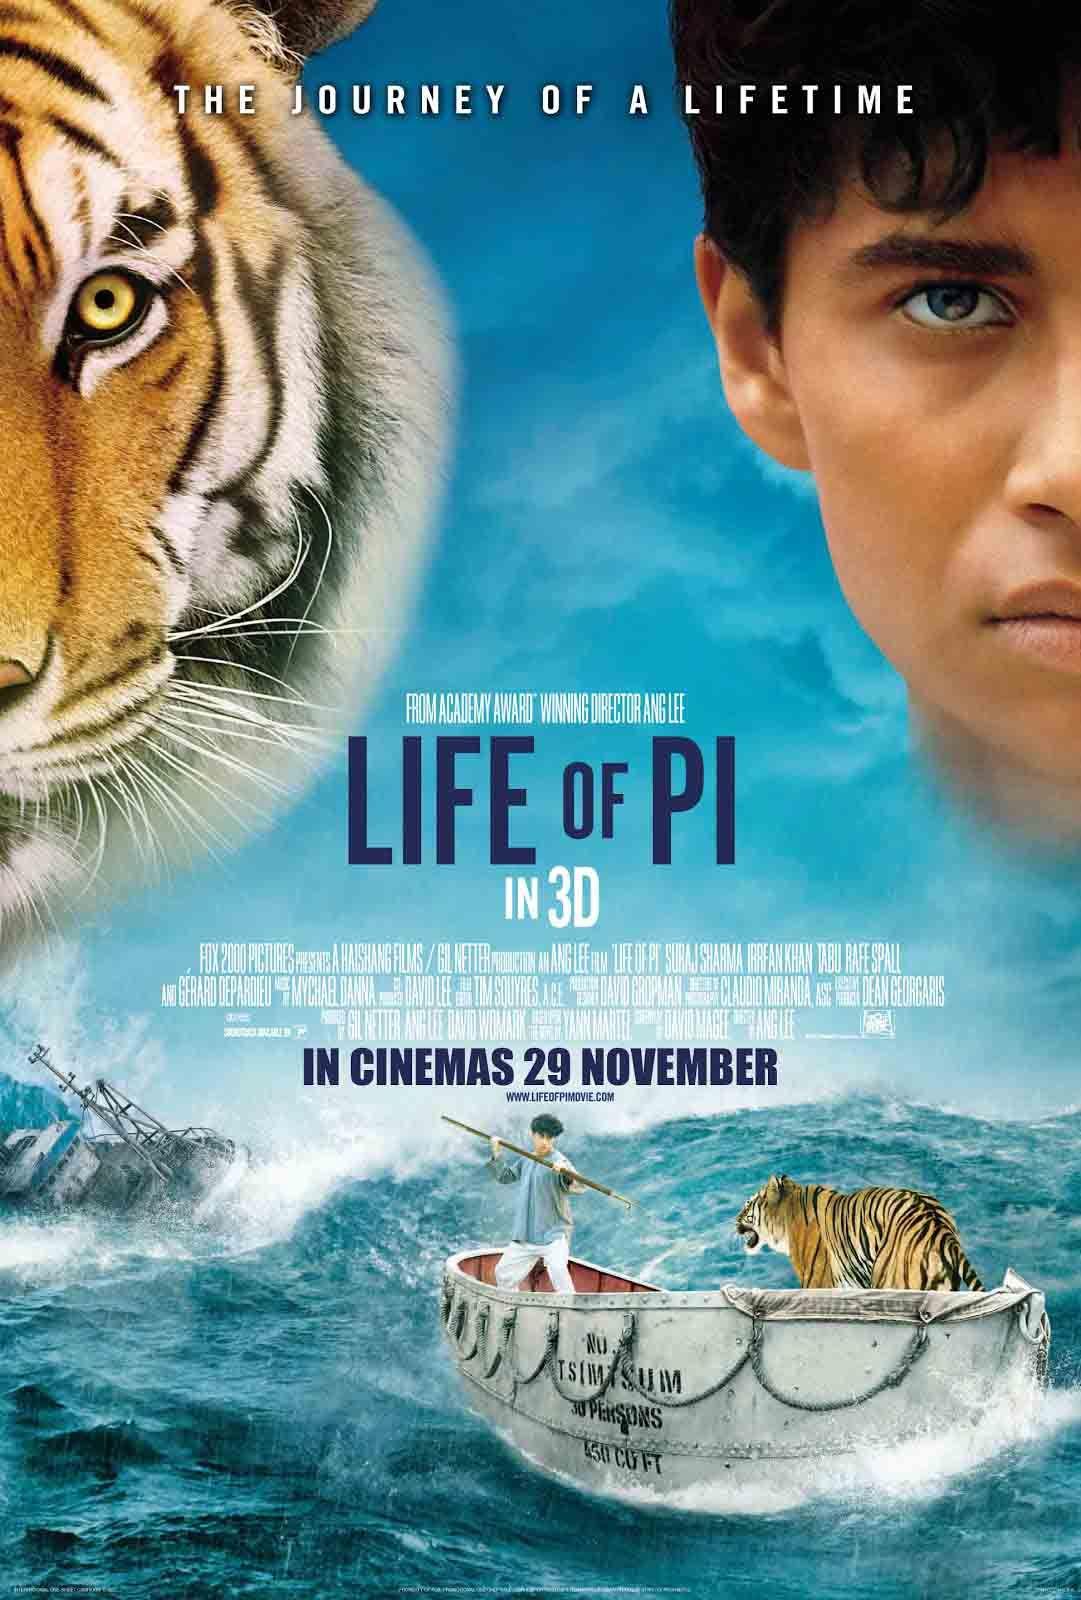 Life Of Pi Life Of Pi Life Of Pi Film Life Of Pi 2012